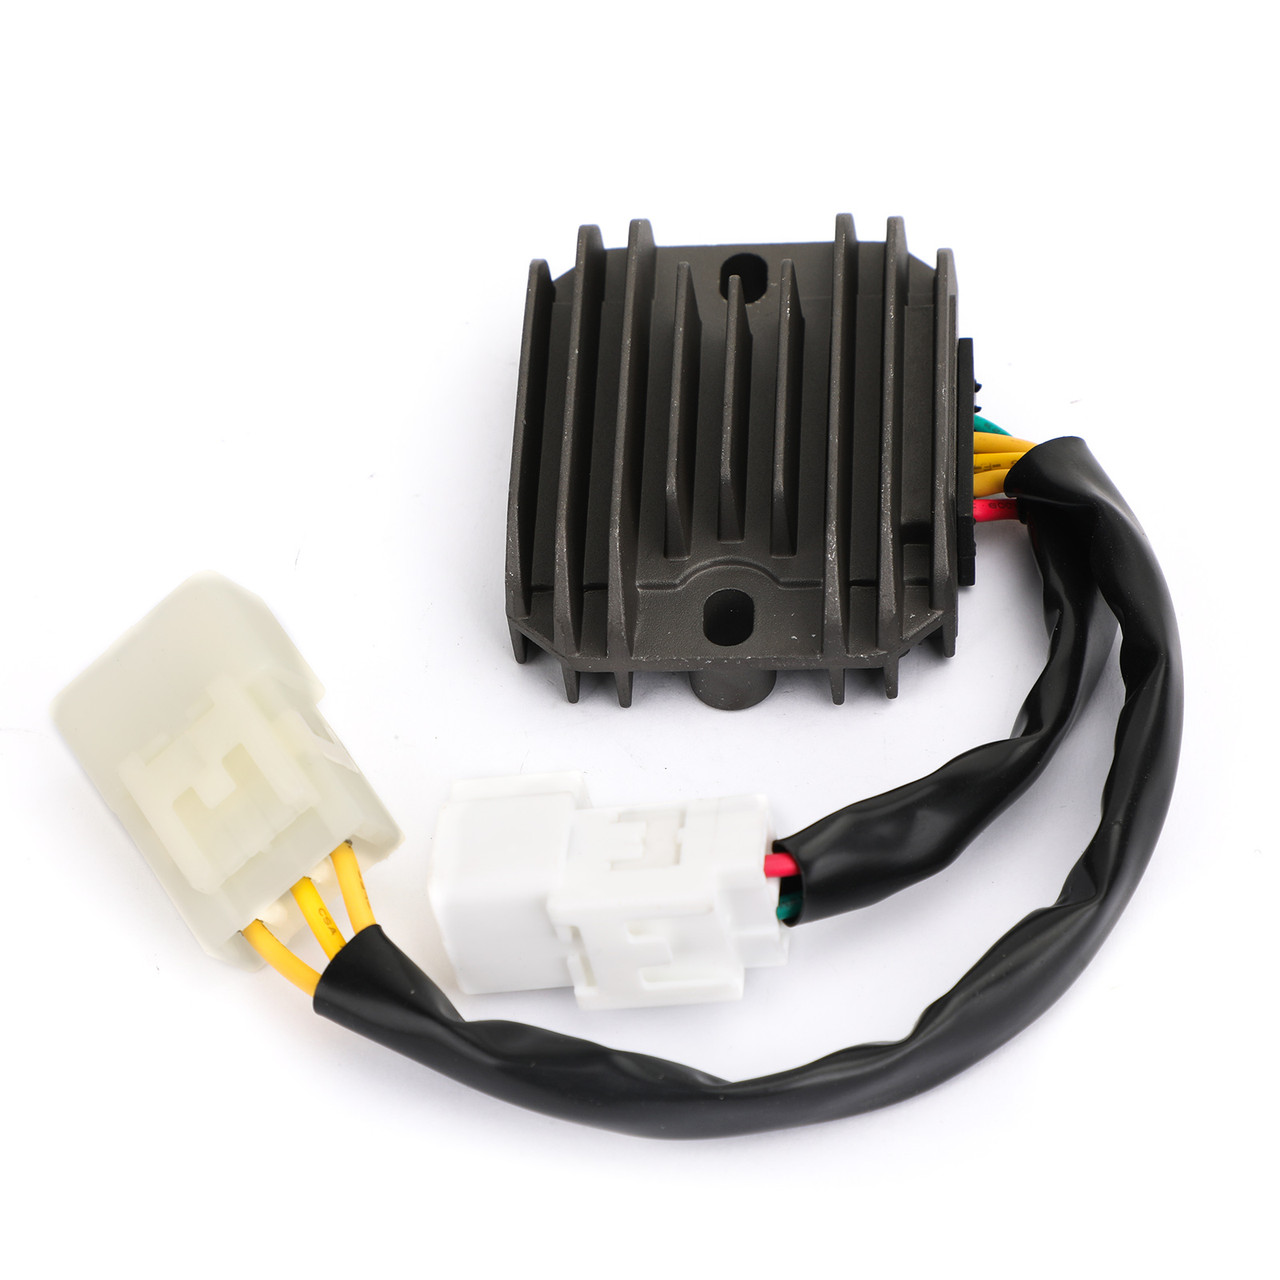 Voltage Regulator Rectifier for Piaggio VESPA LX FLY LIBERTY 125 150